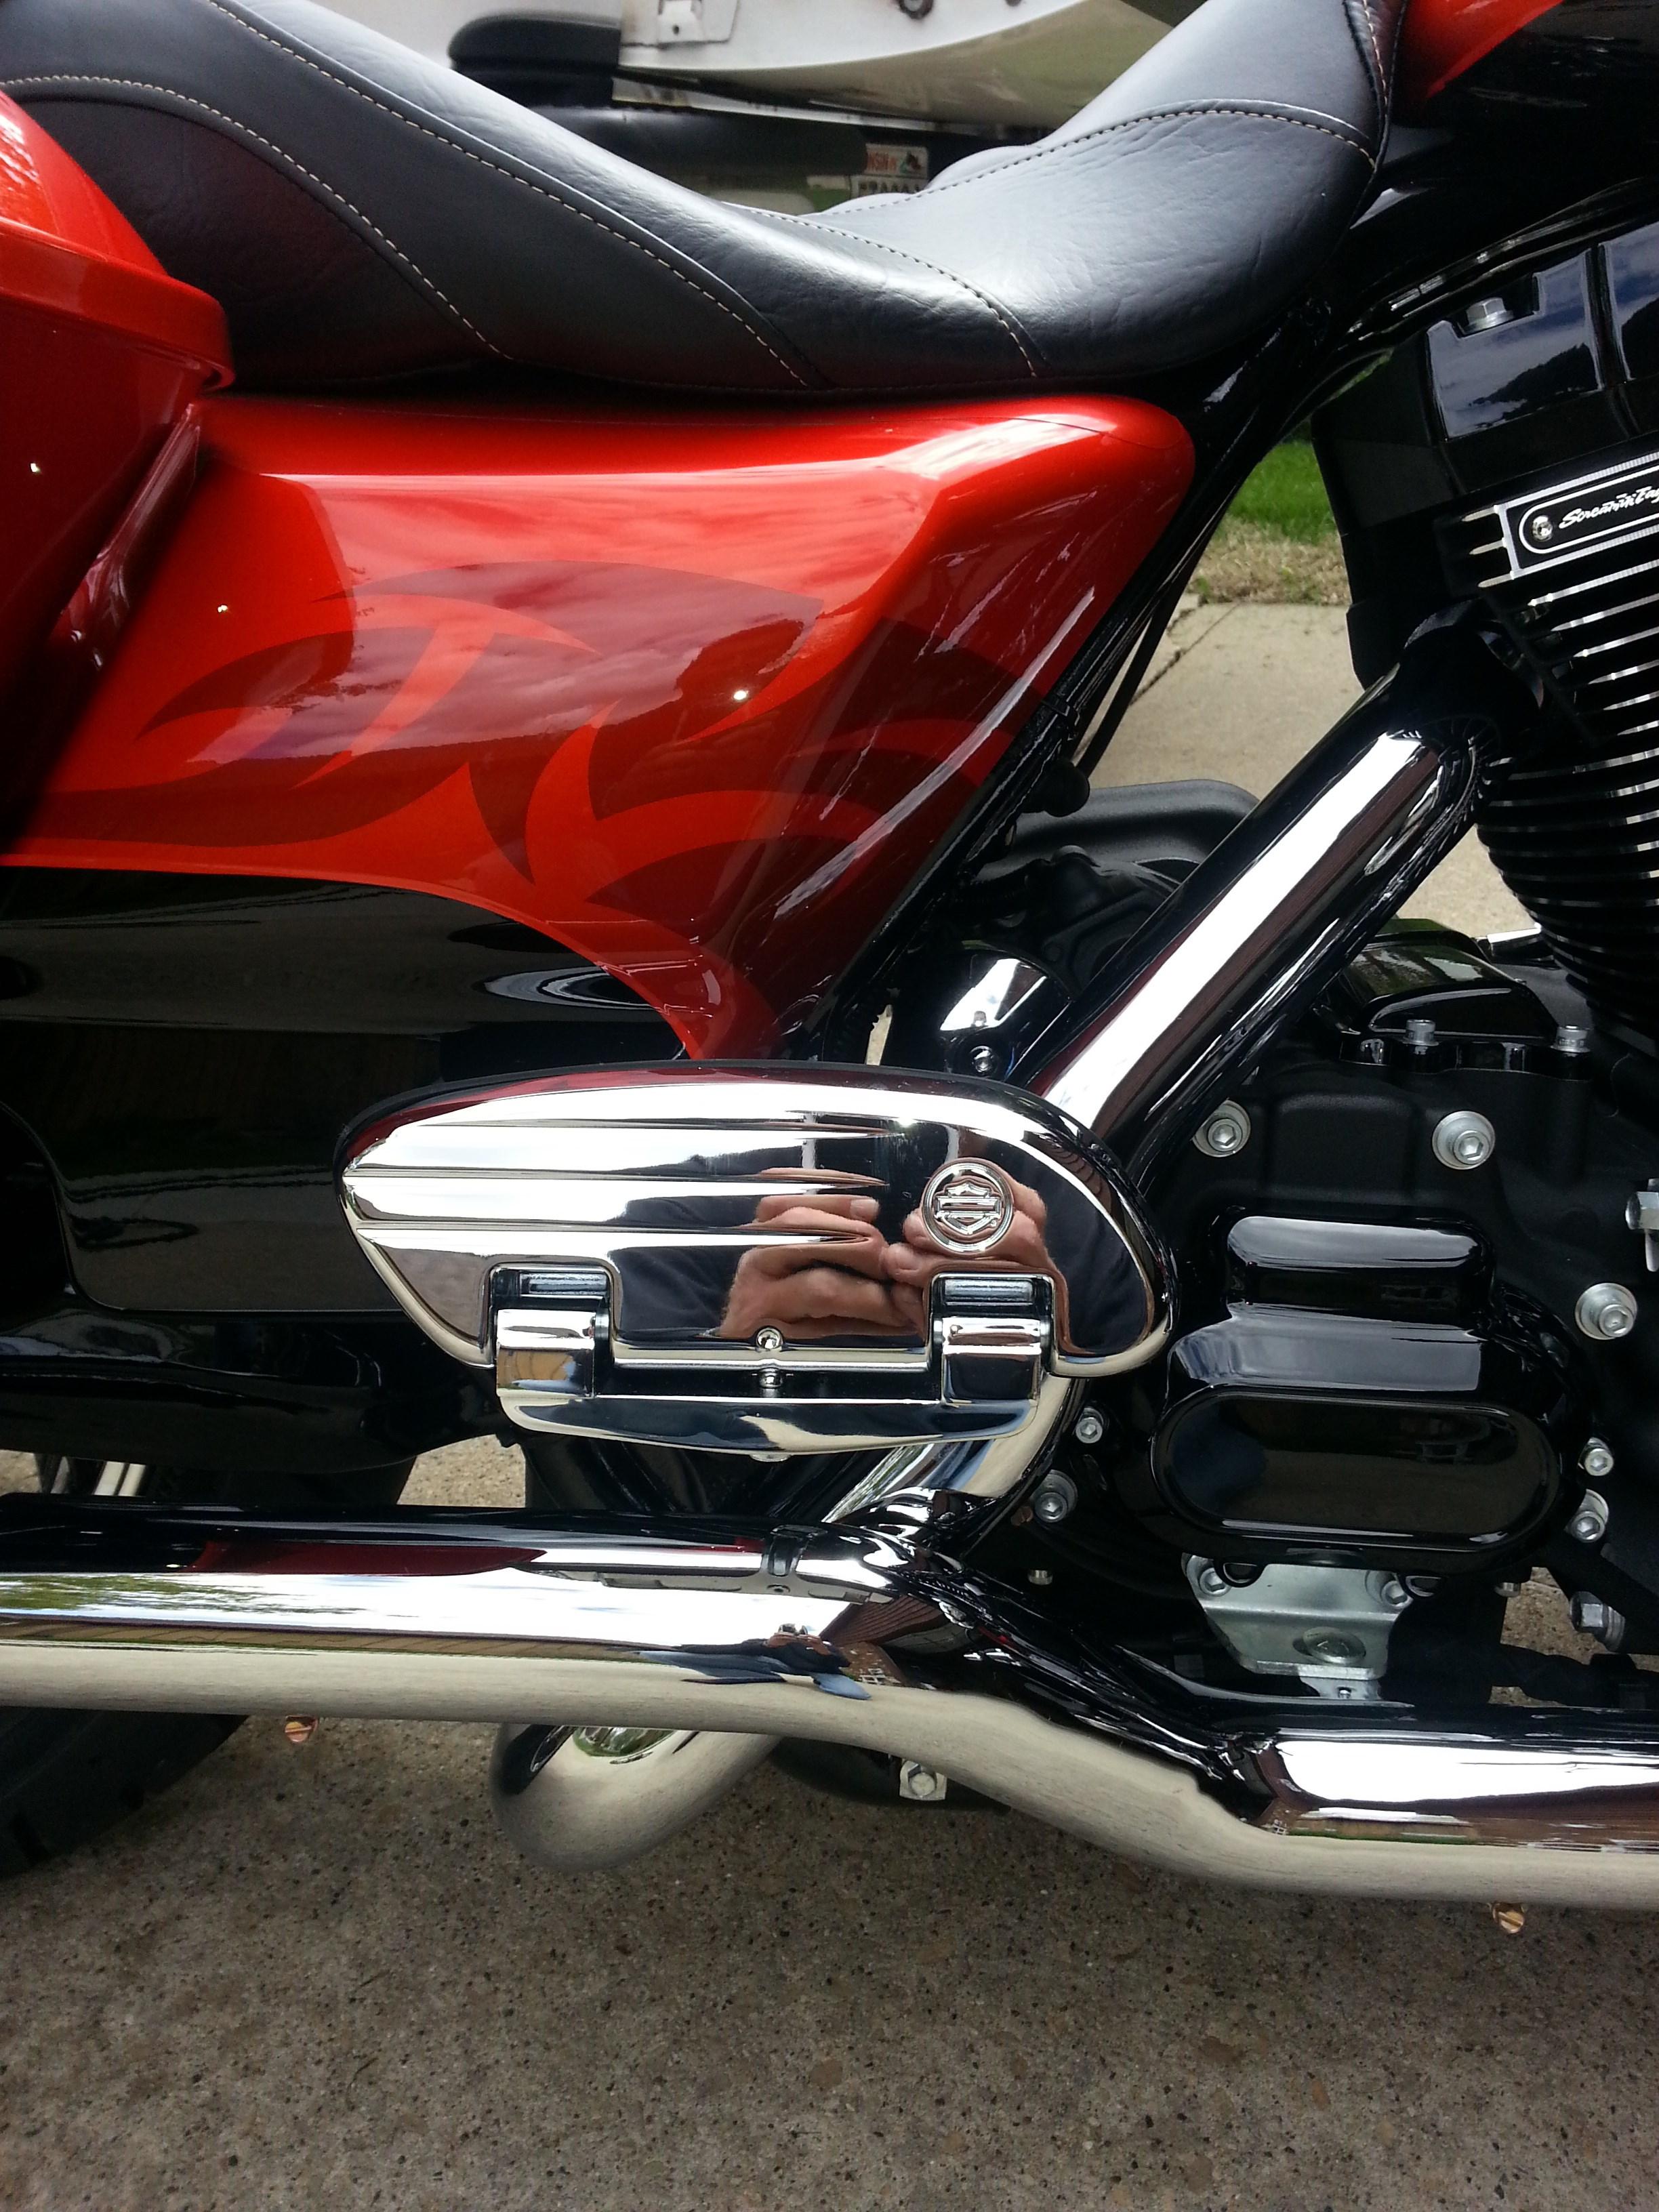 2014 Harley Davidson 174 Flhrse5 Cvo Road King 174 Tribal